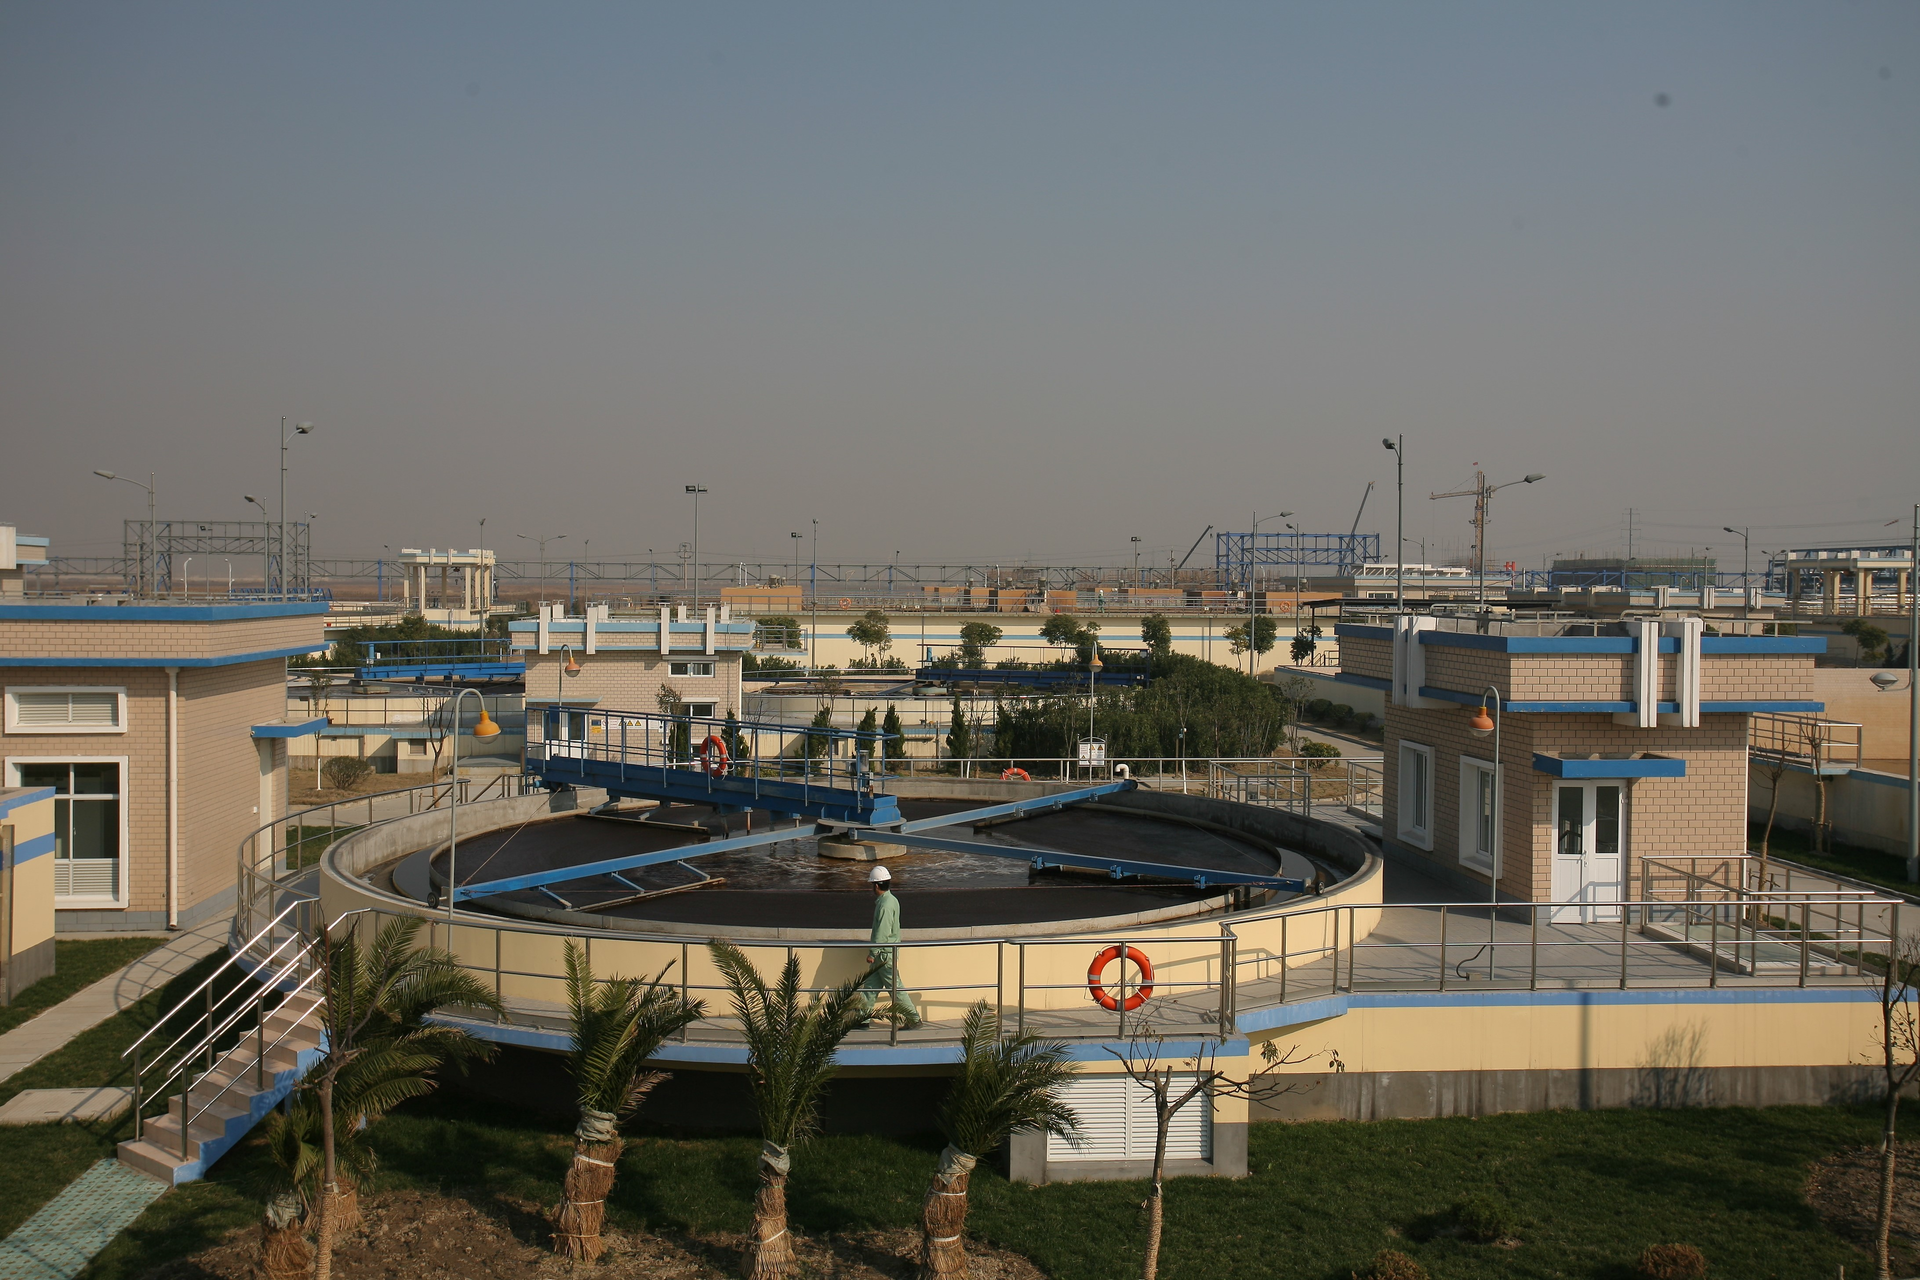 Content Dam Ww Online Articles 2019 03 Wwi Suez China